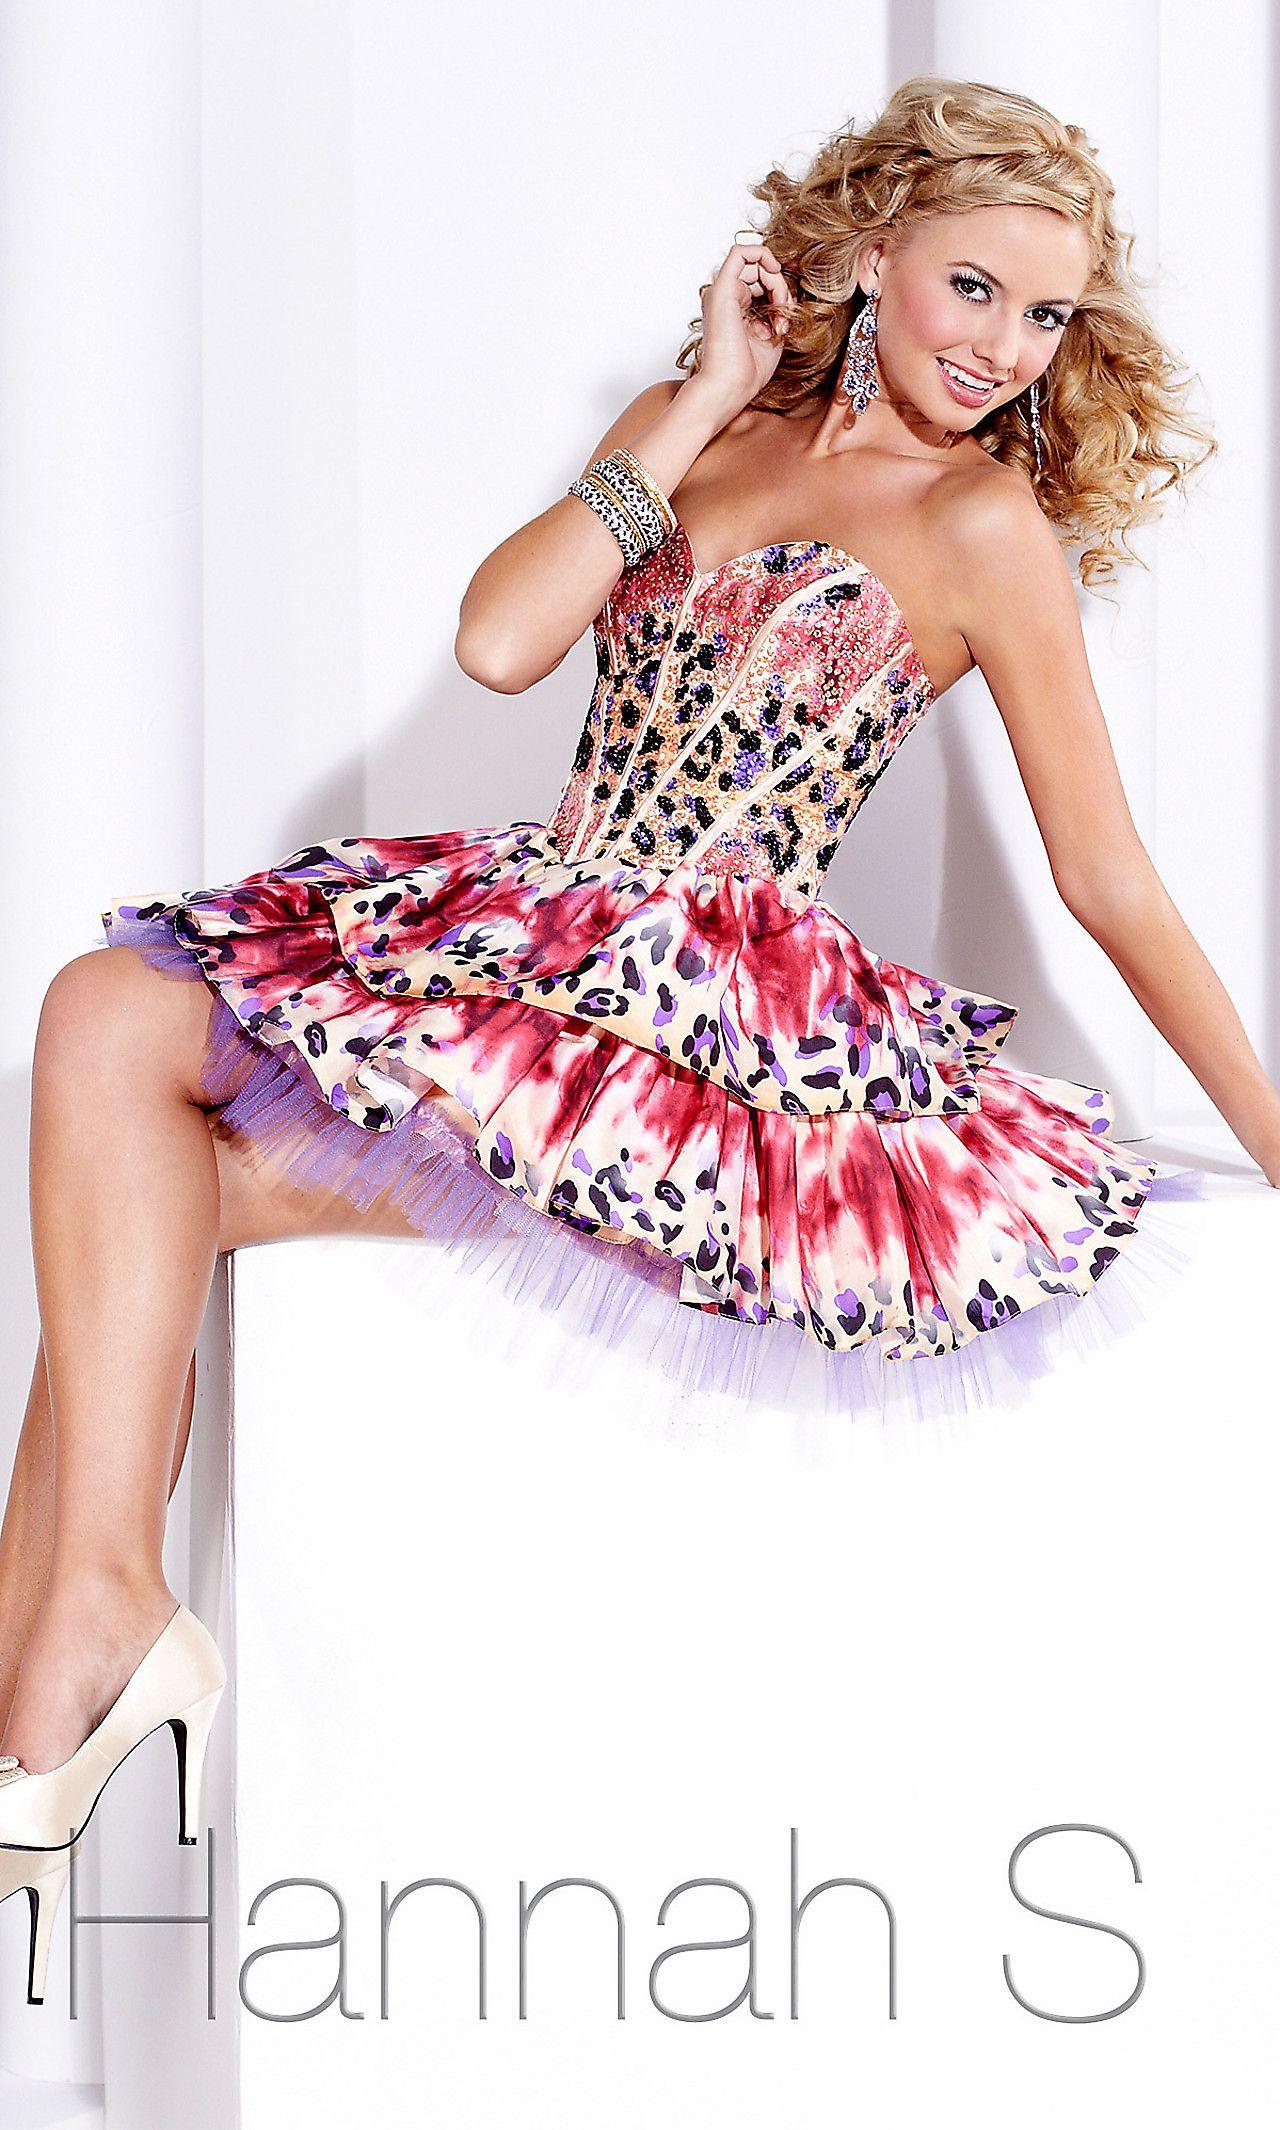 Strapless Animal Print Short Dress HS-27683 | Fashion | Pinterest ...